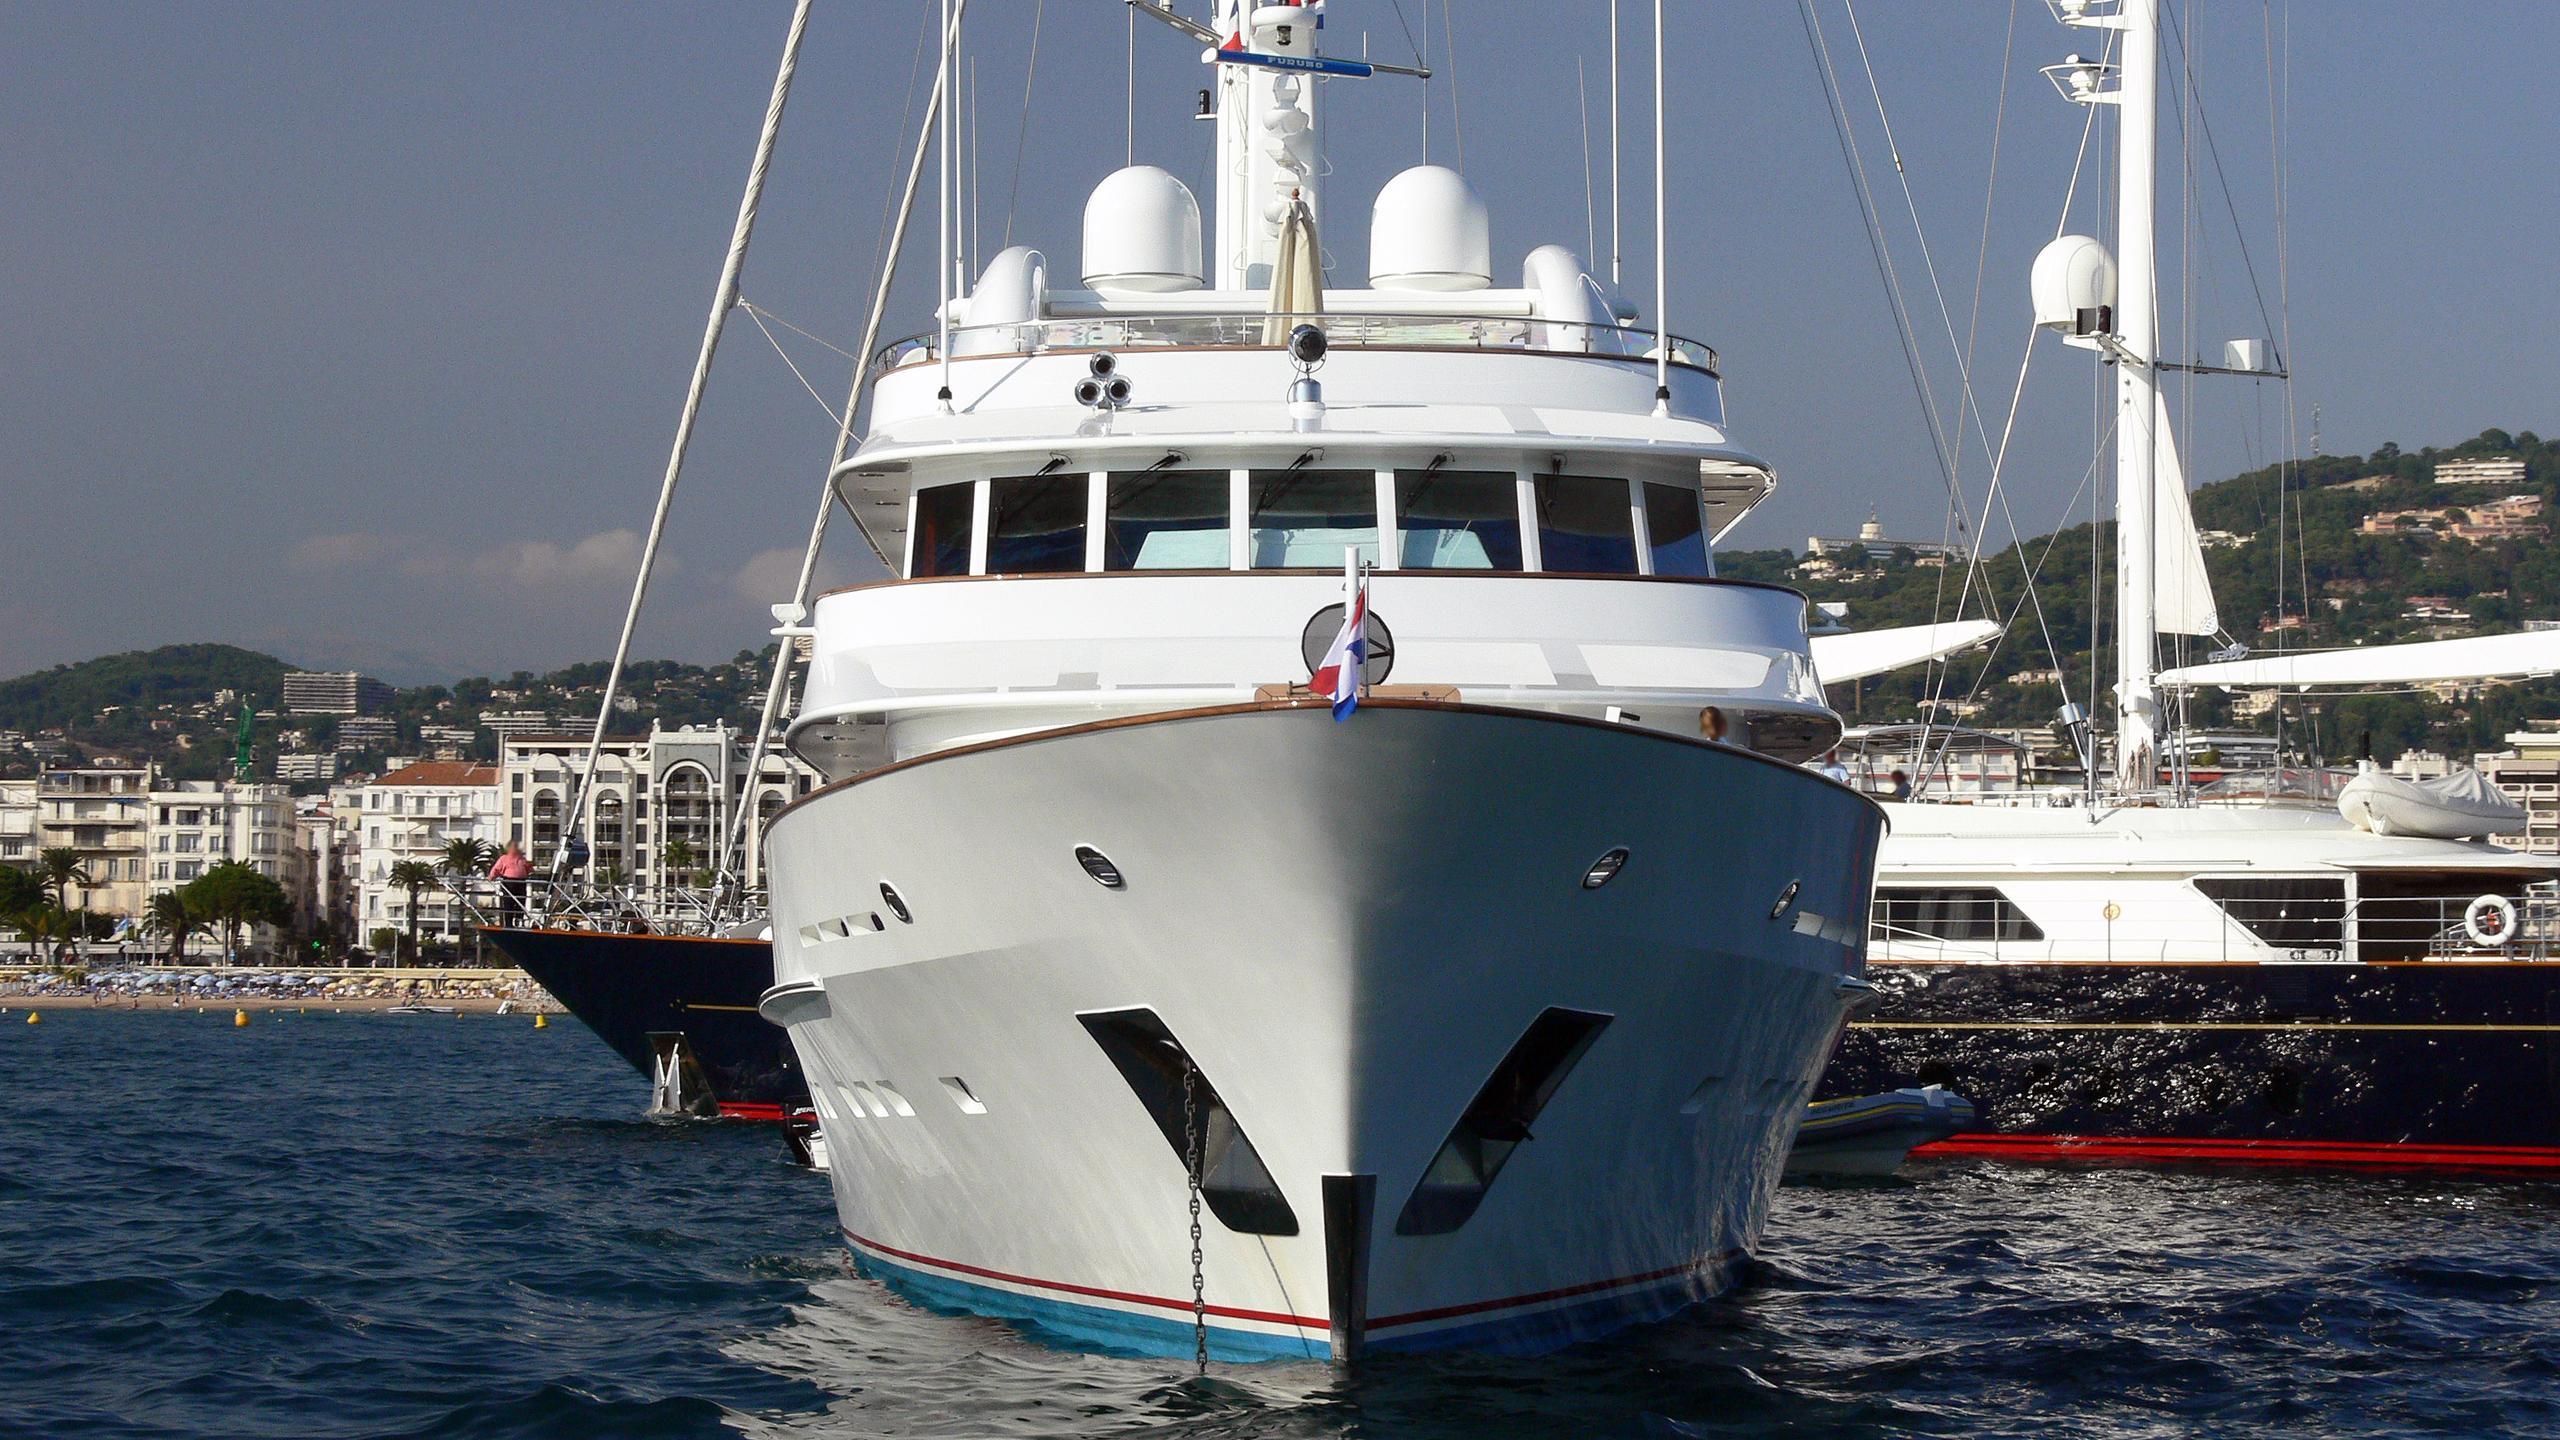 lady-duvera-motor-yacht-hakvoort-200-44m-bow